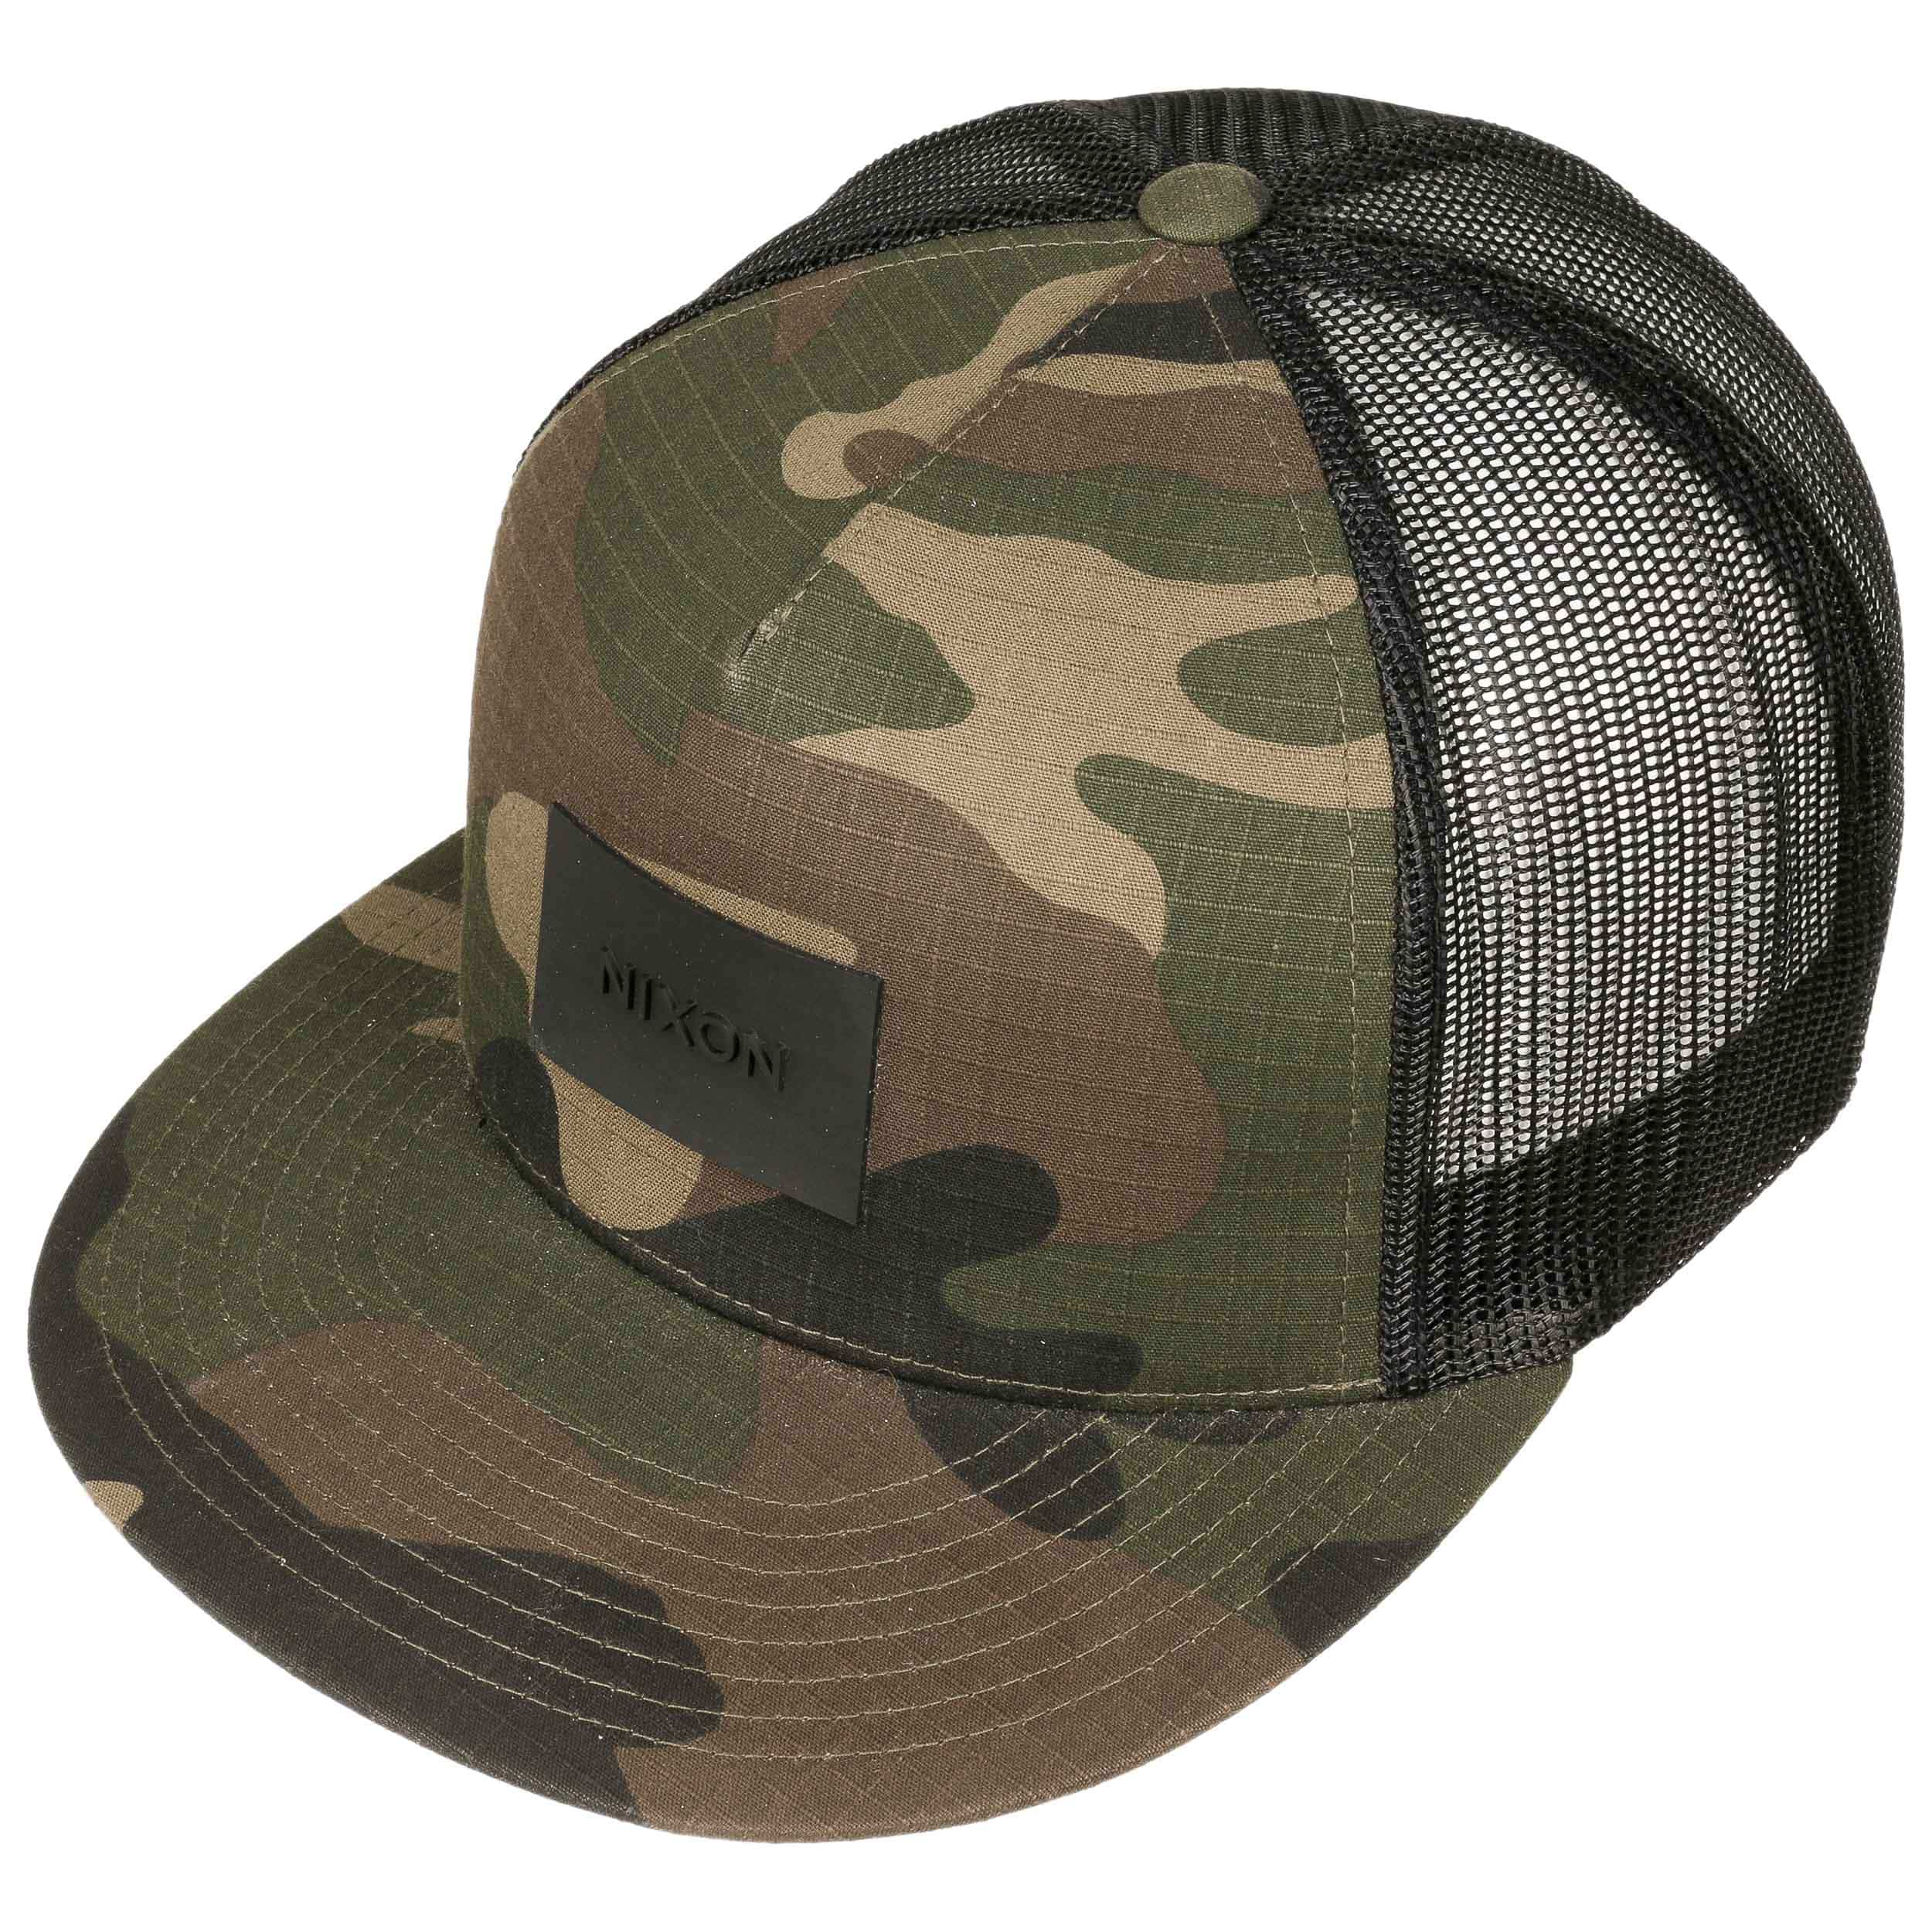 ... Team Trucker Cap by Nixon - camouflage 1 ... 68de5a52a9b